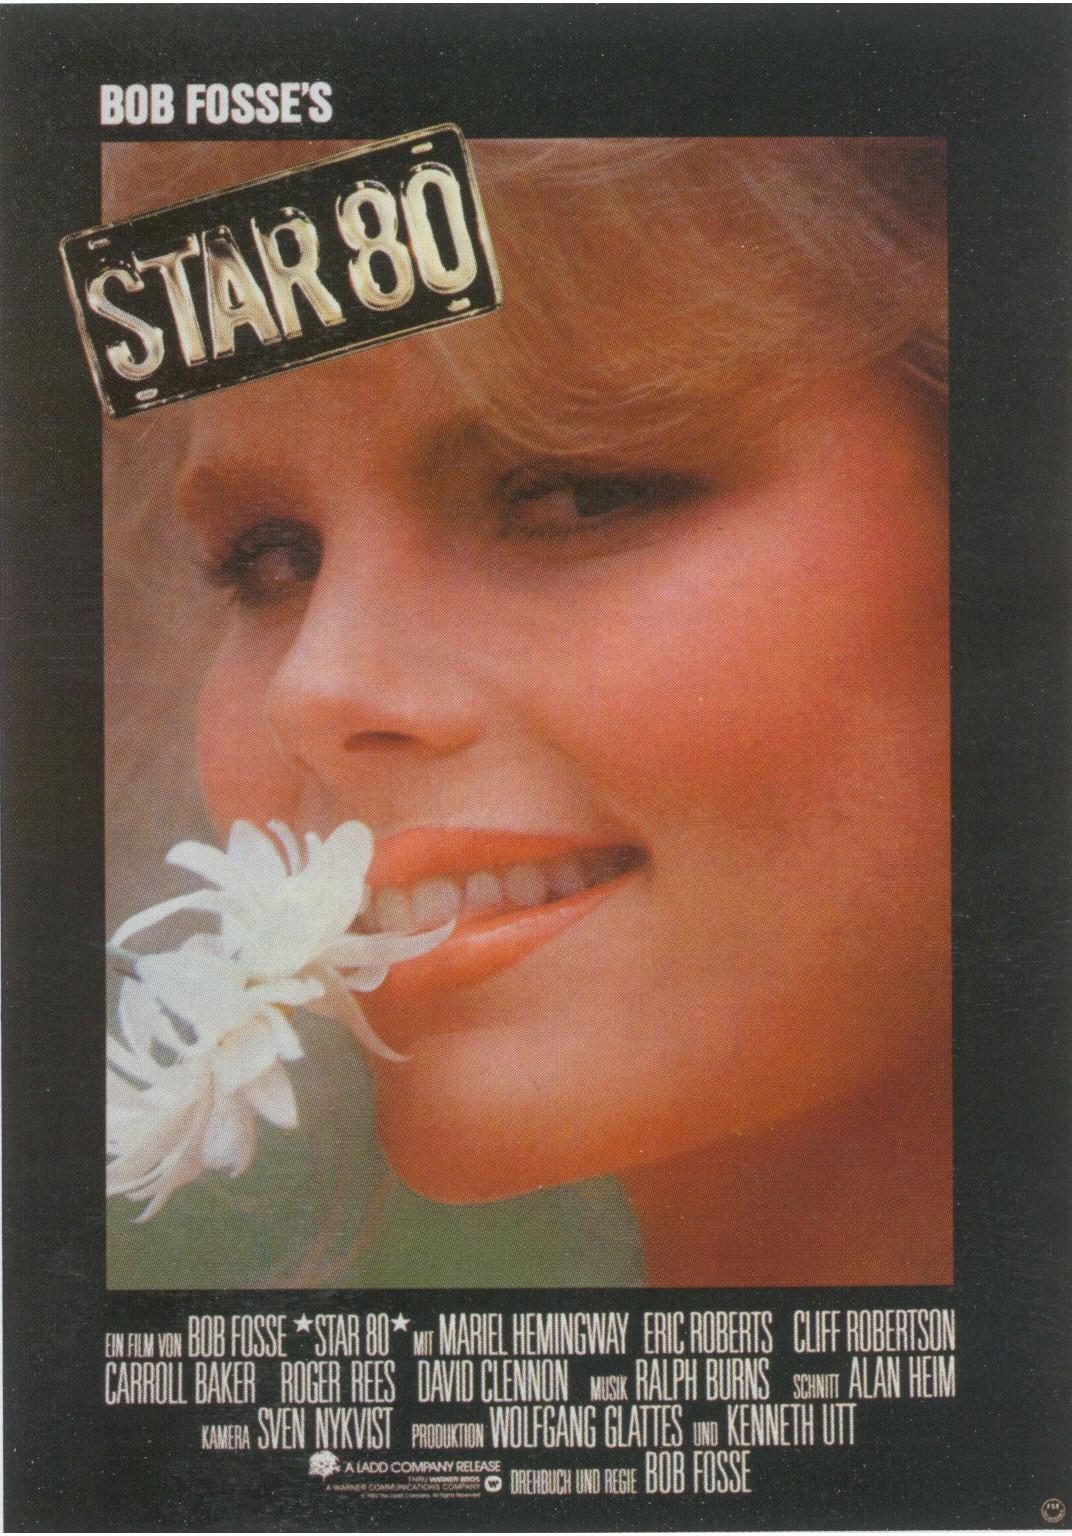 http://www.c1n3.org/f/fosse01b/Images/1983%20Star%2080%20(ale).jpg